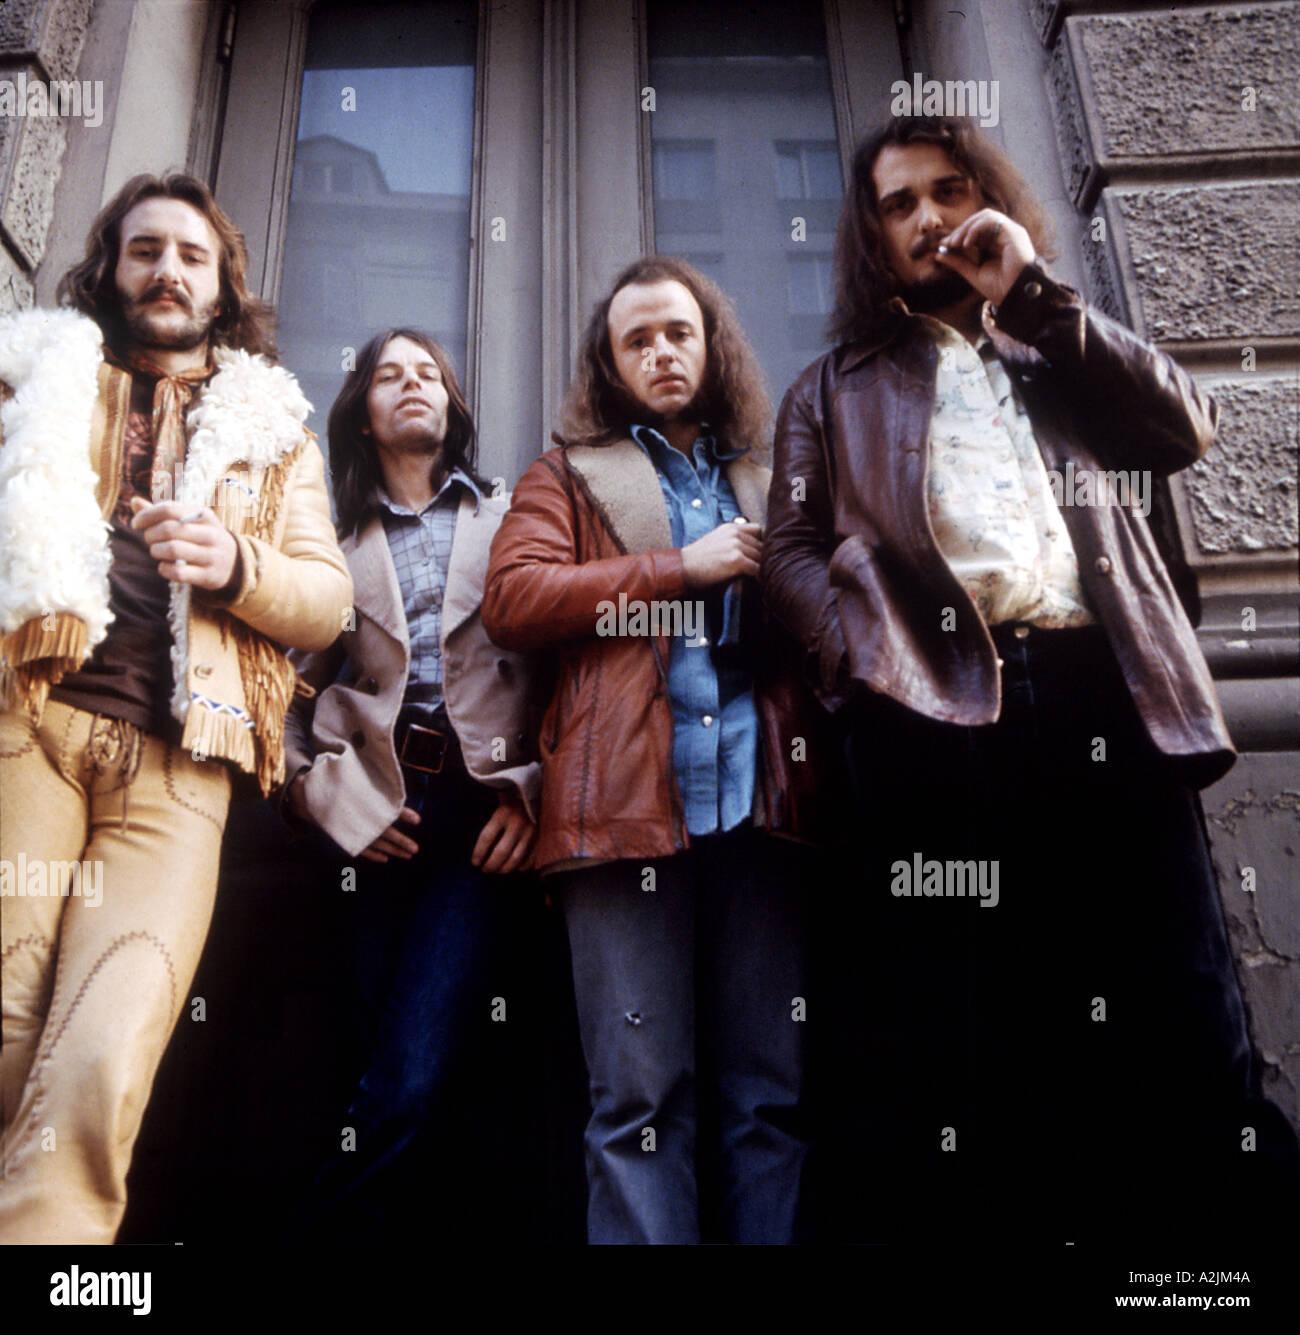 FREE rock band - Stock Image